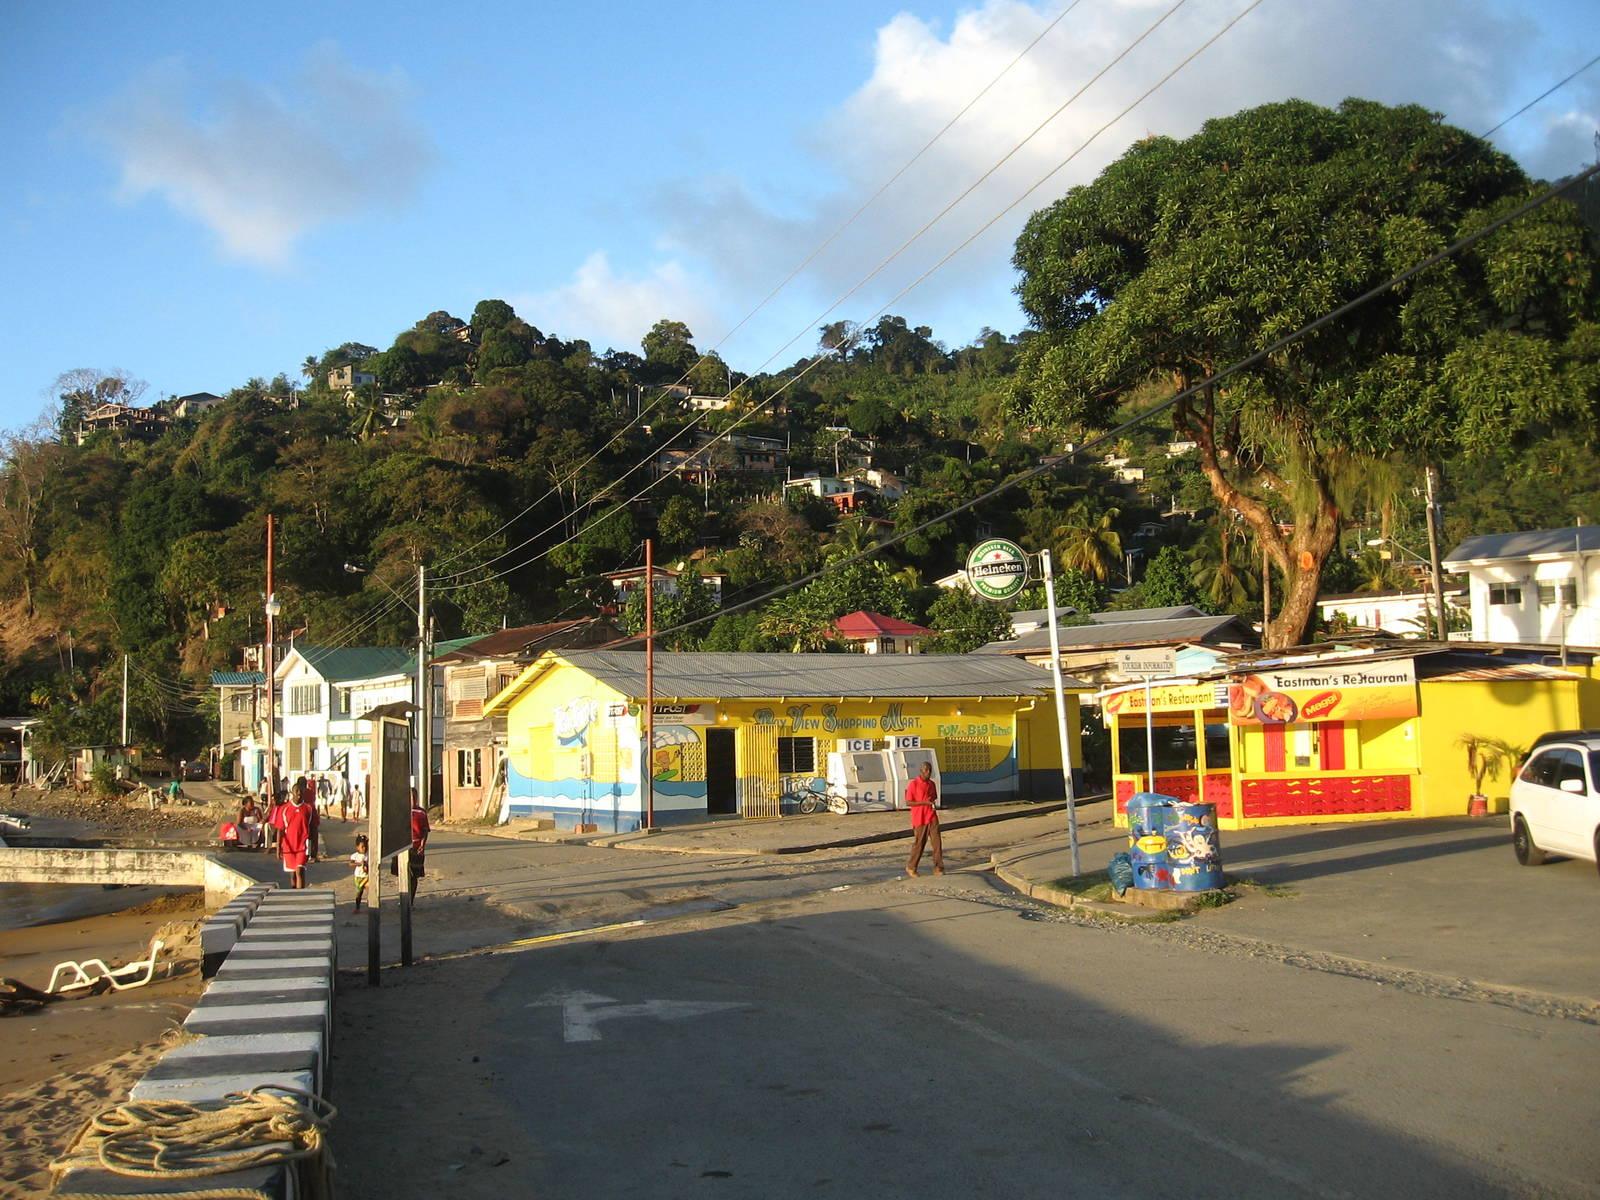 Charlotteville Destination Trinidad and Tobago  Tours